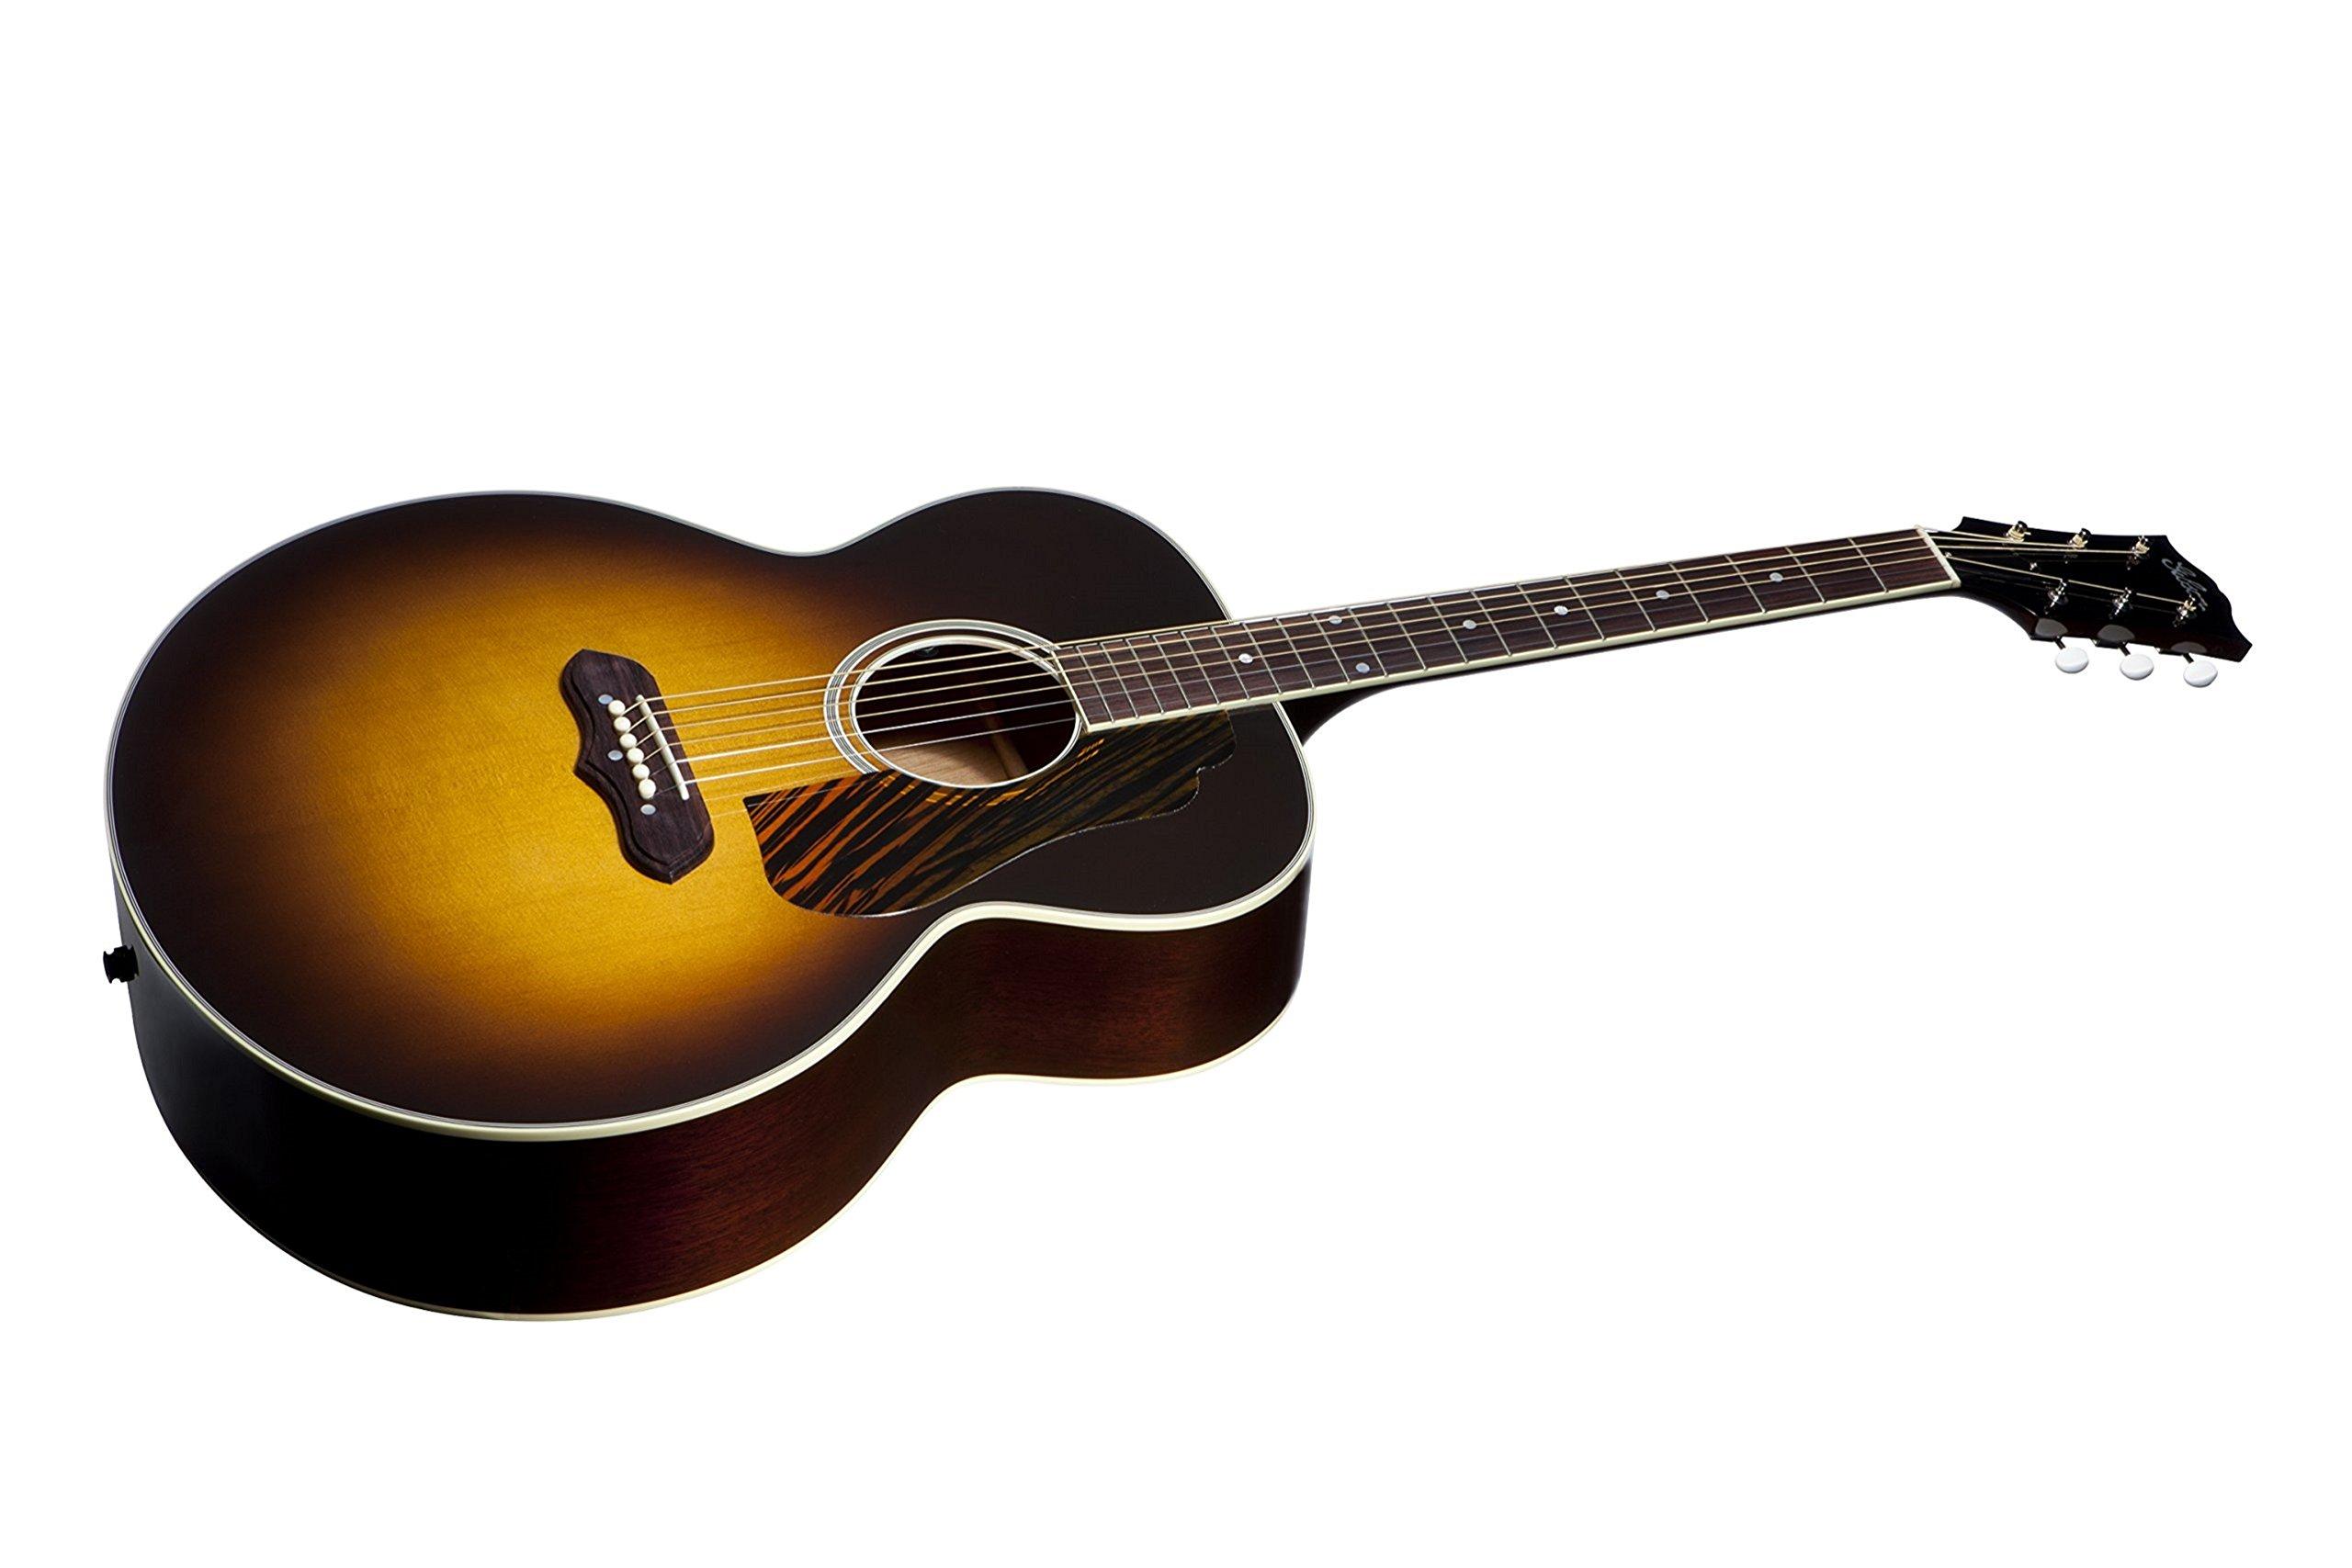 Gibson 1941 SJ-100 VS · Guitarra acústica: Amazon.es: Instrumentos ...